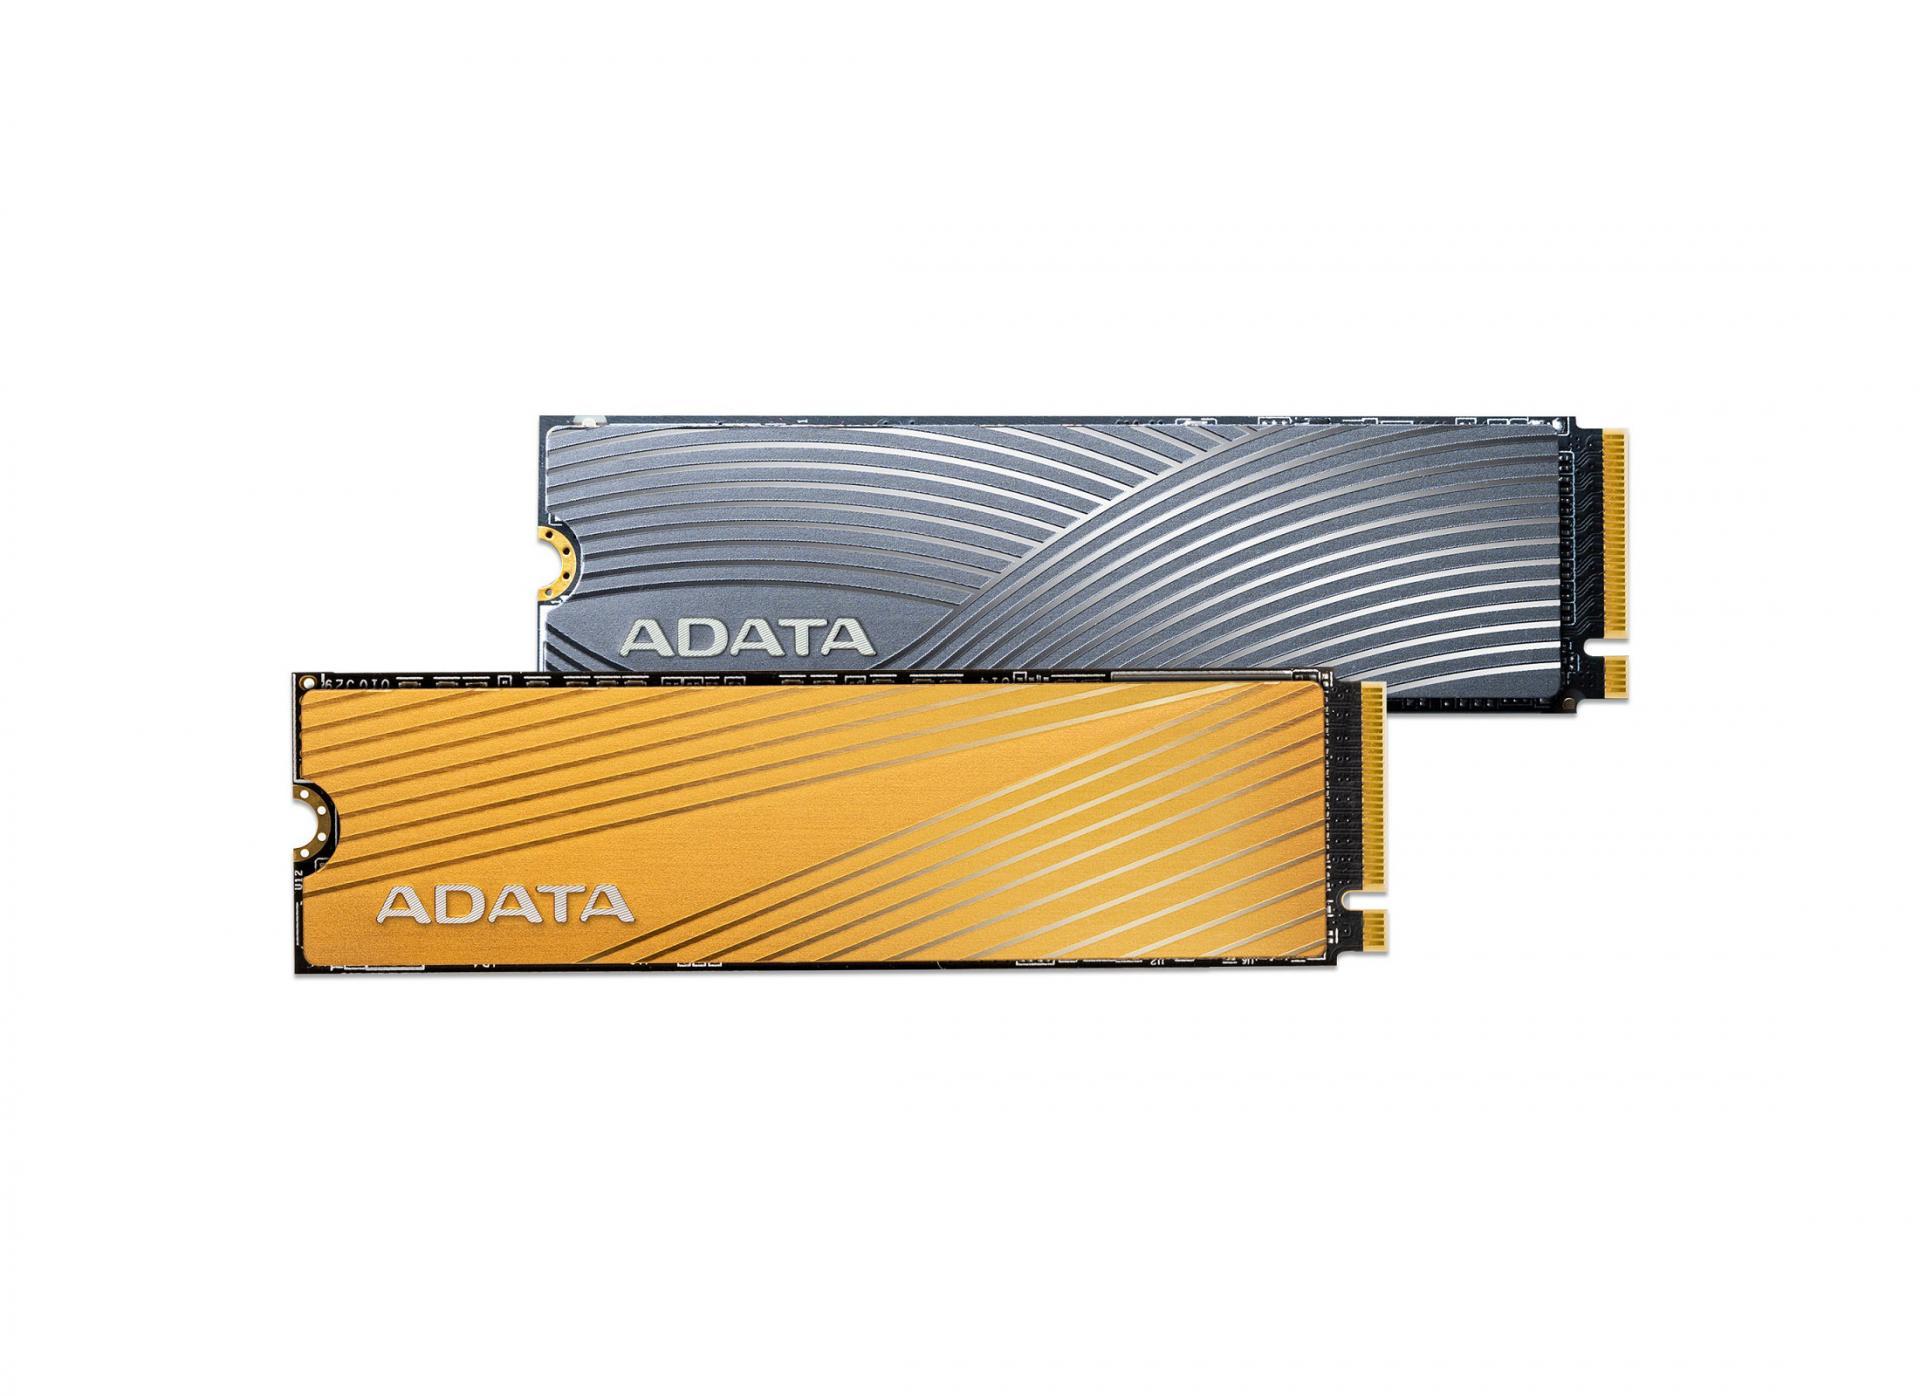 SSD Falcon иSwordfish отADATA. Оба PCIe Gen3×4 M.2 2280